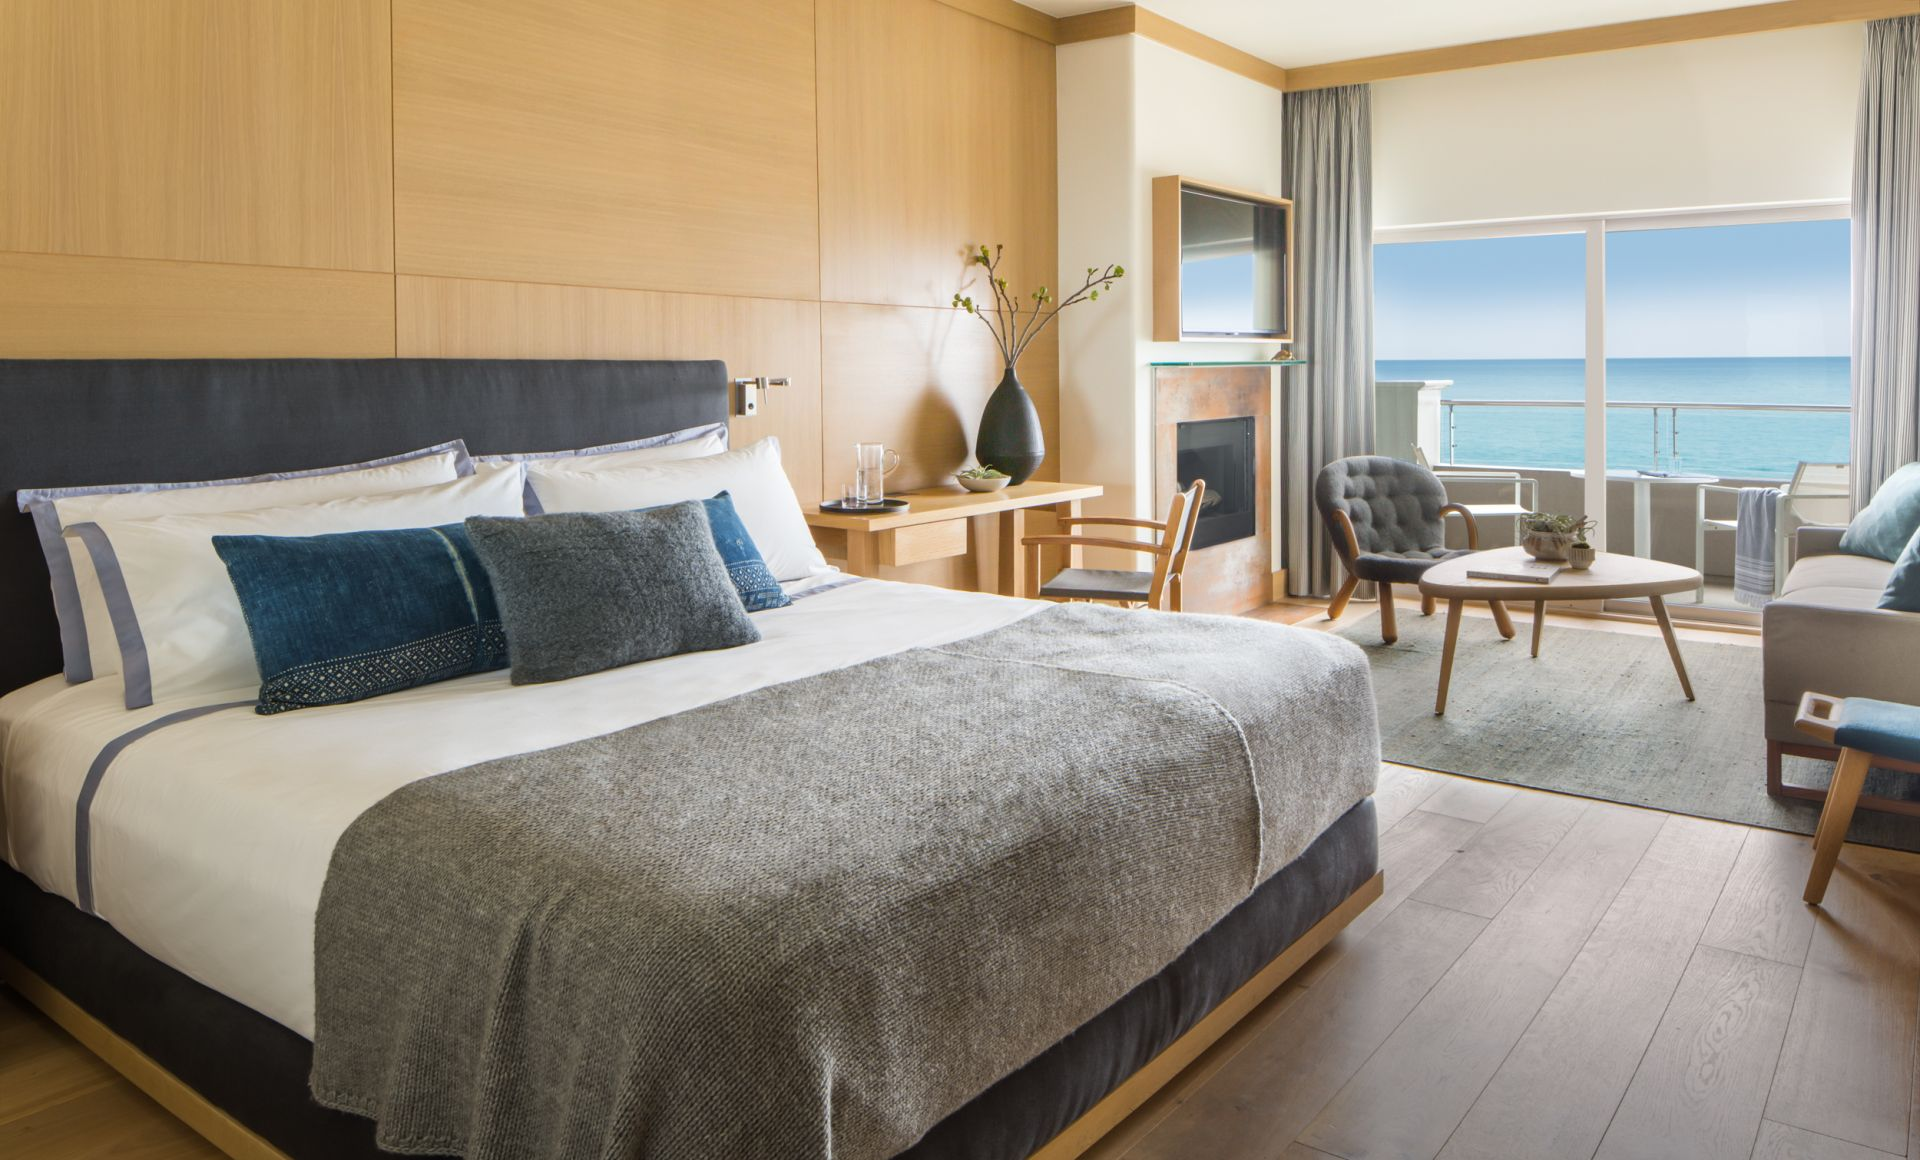 King Premier Ocean Front Luxury Hotel Rooms | Malibu Beach Inn